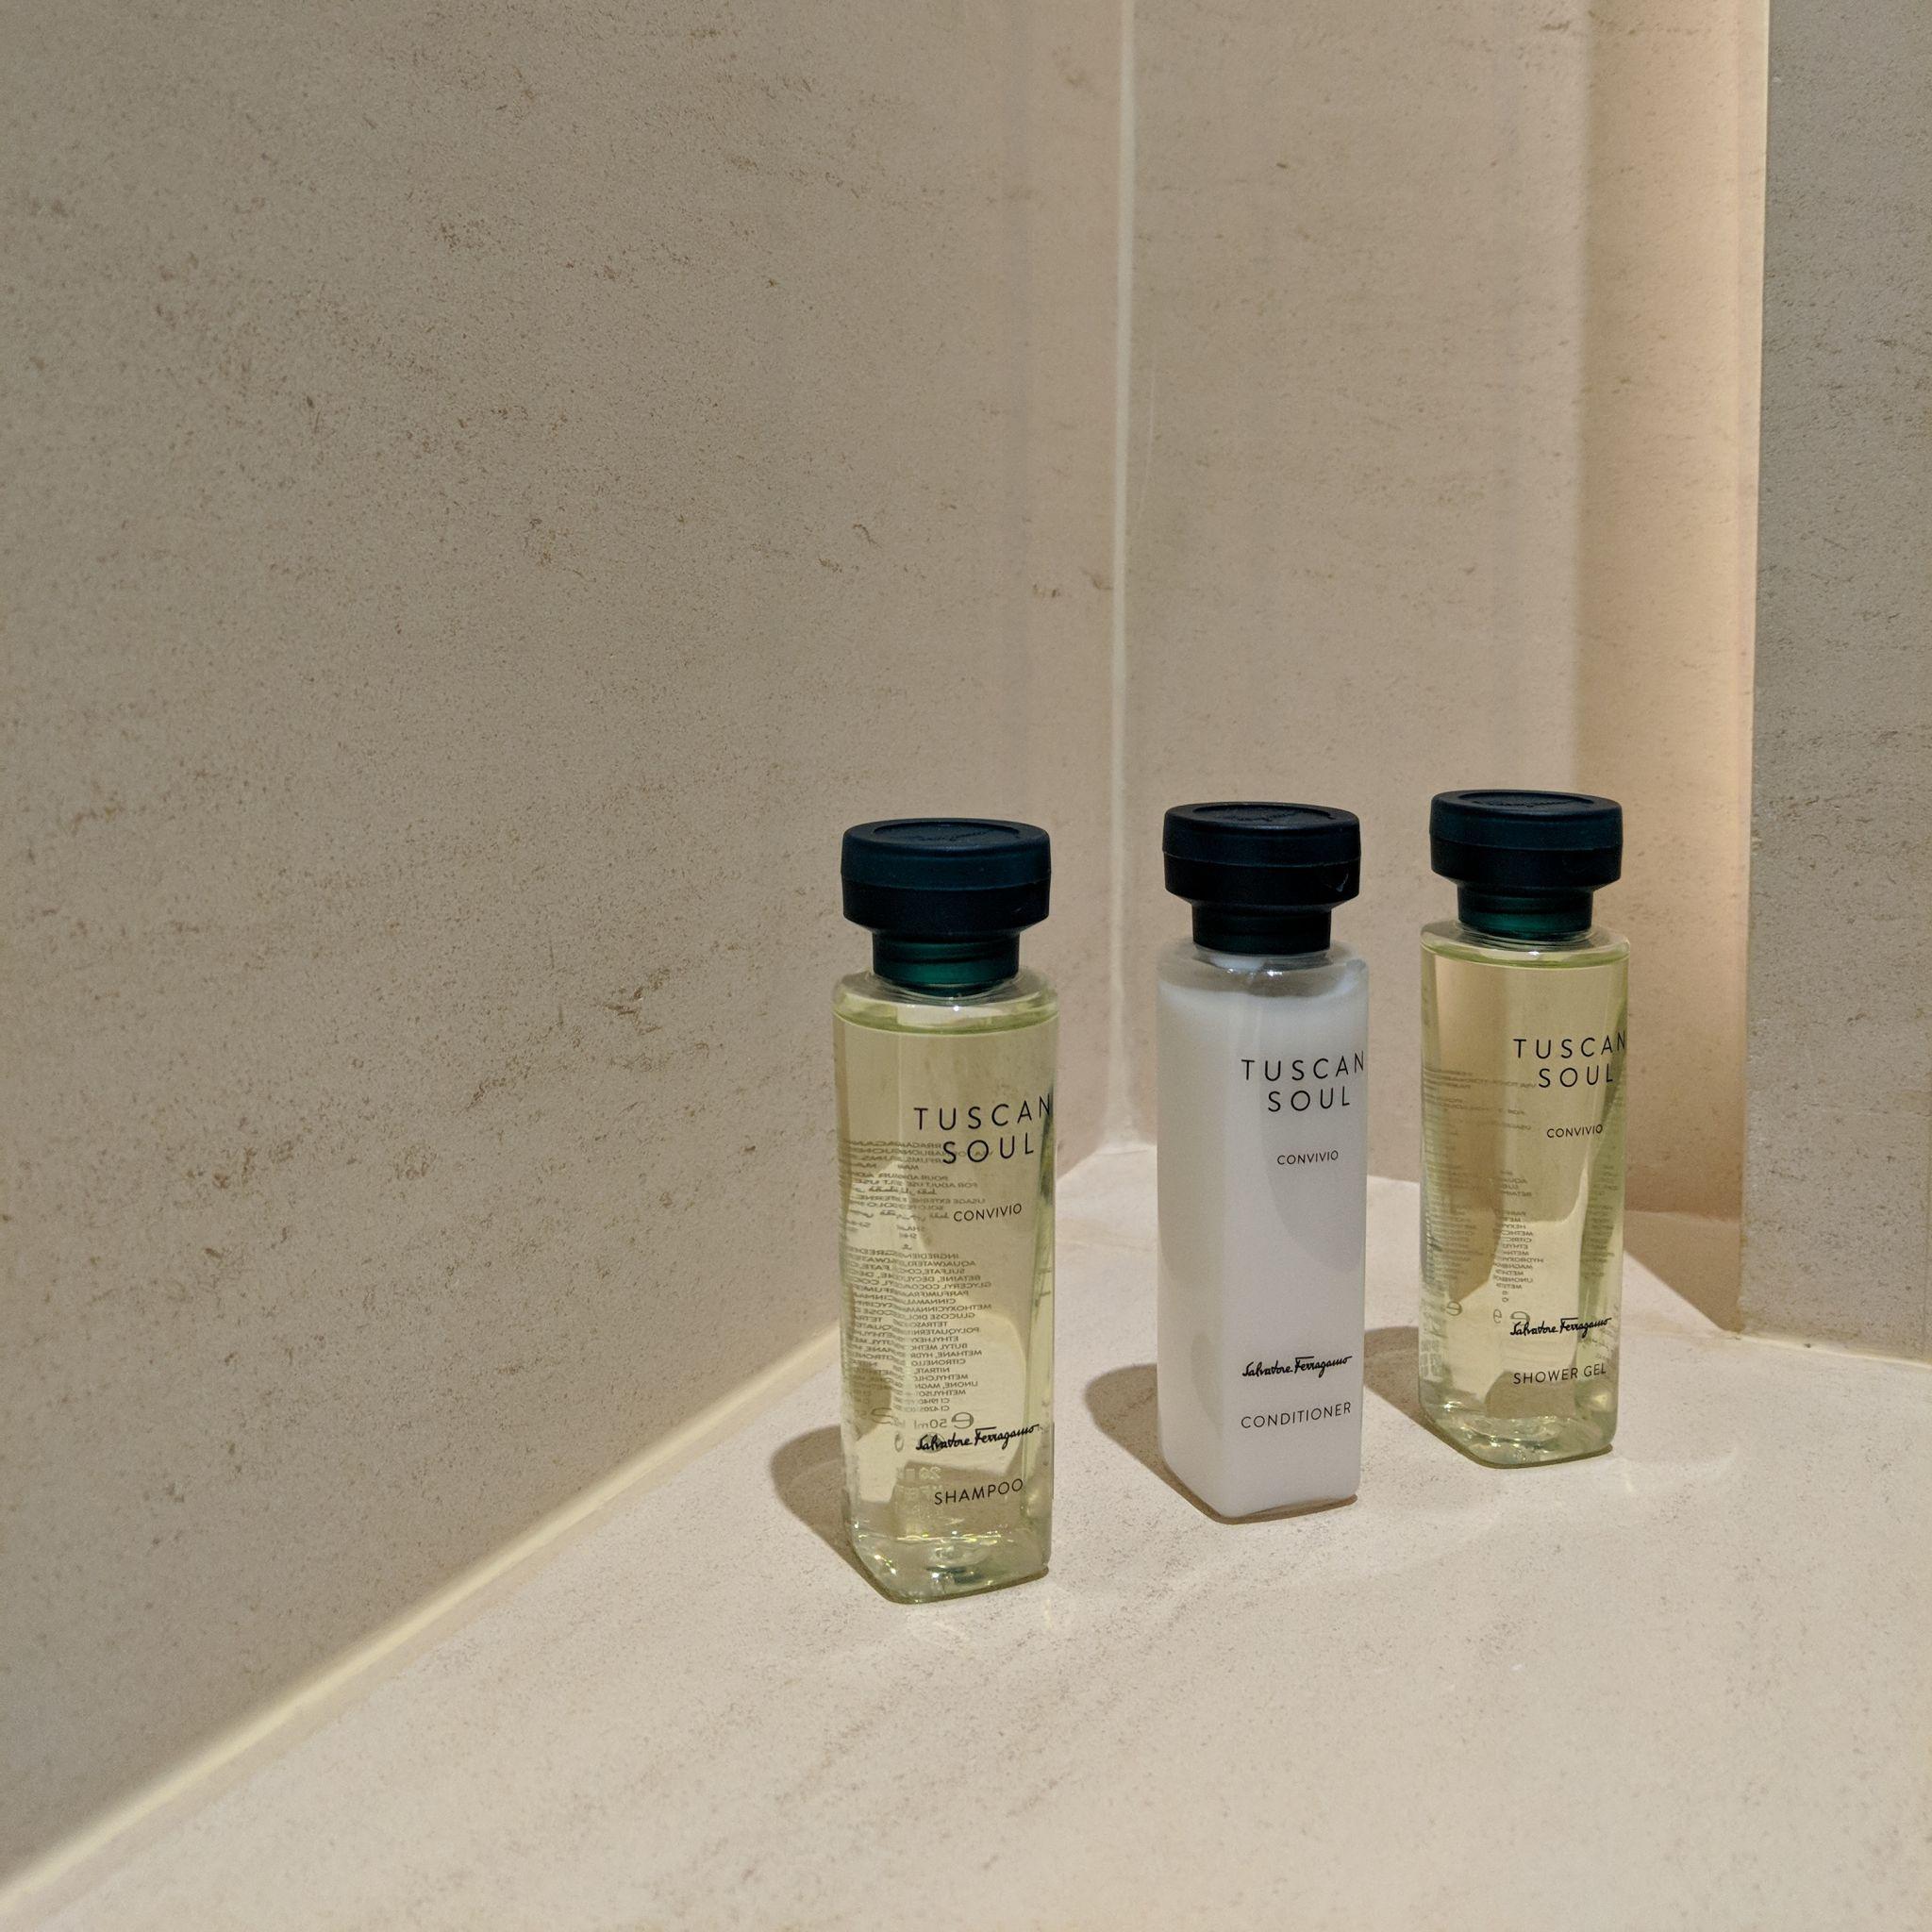 The Capitol Kempinski Hotel Singapore stamford suite bathroom amenities